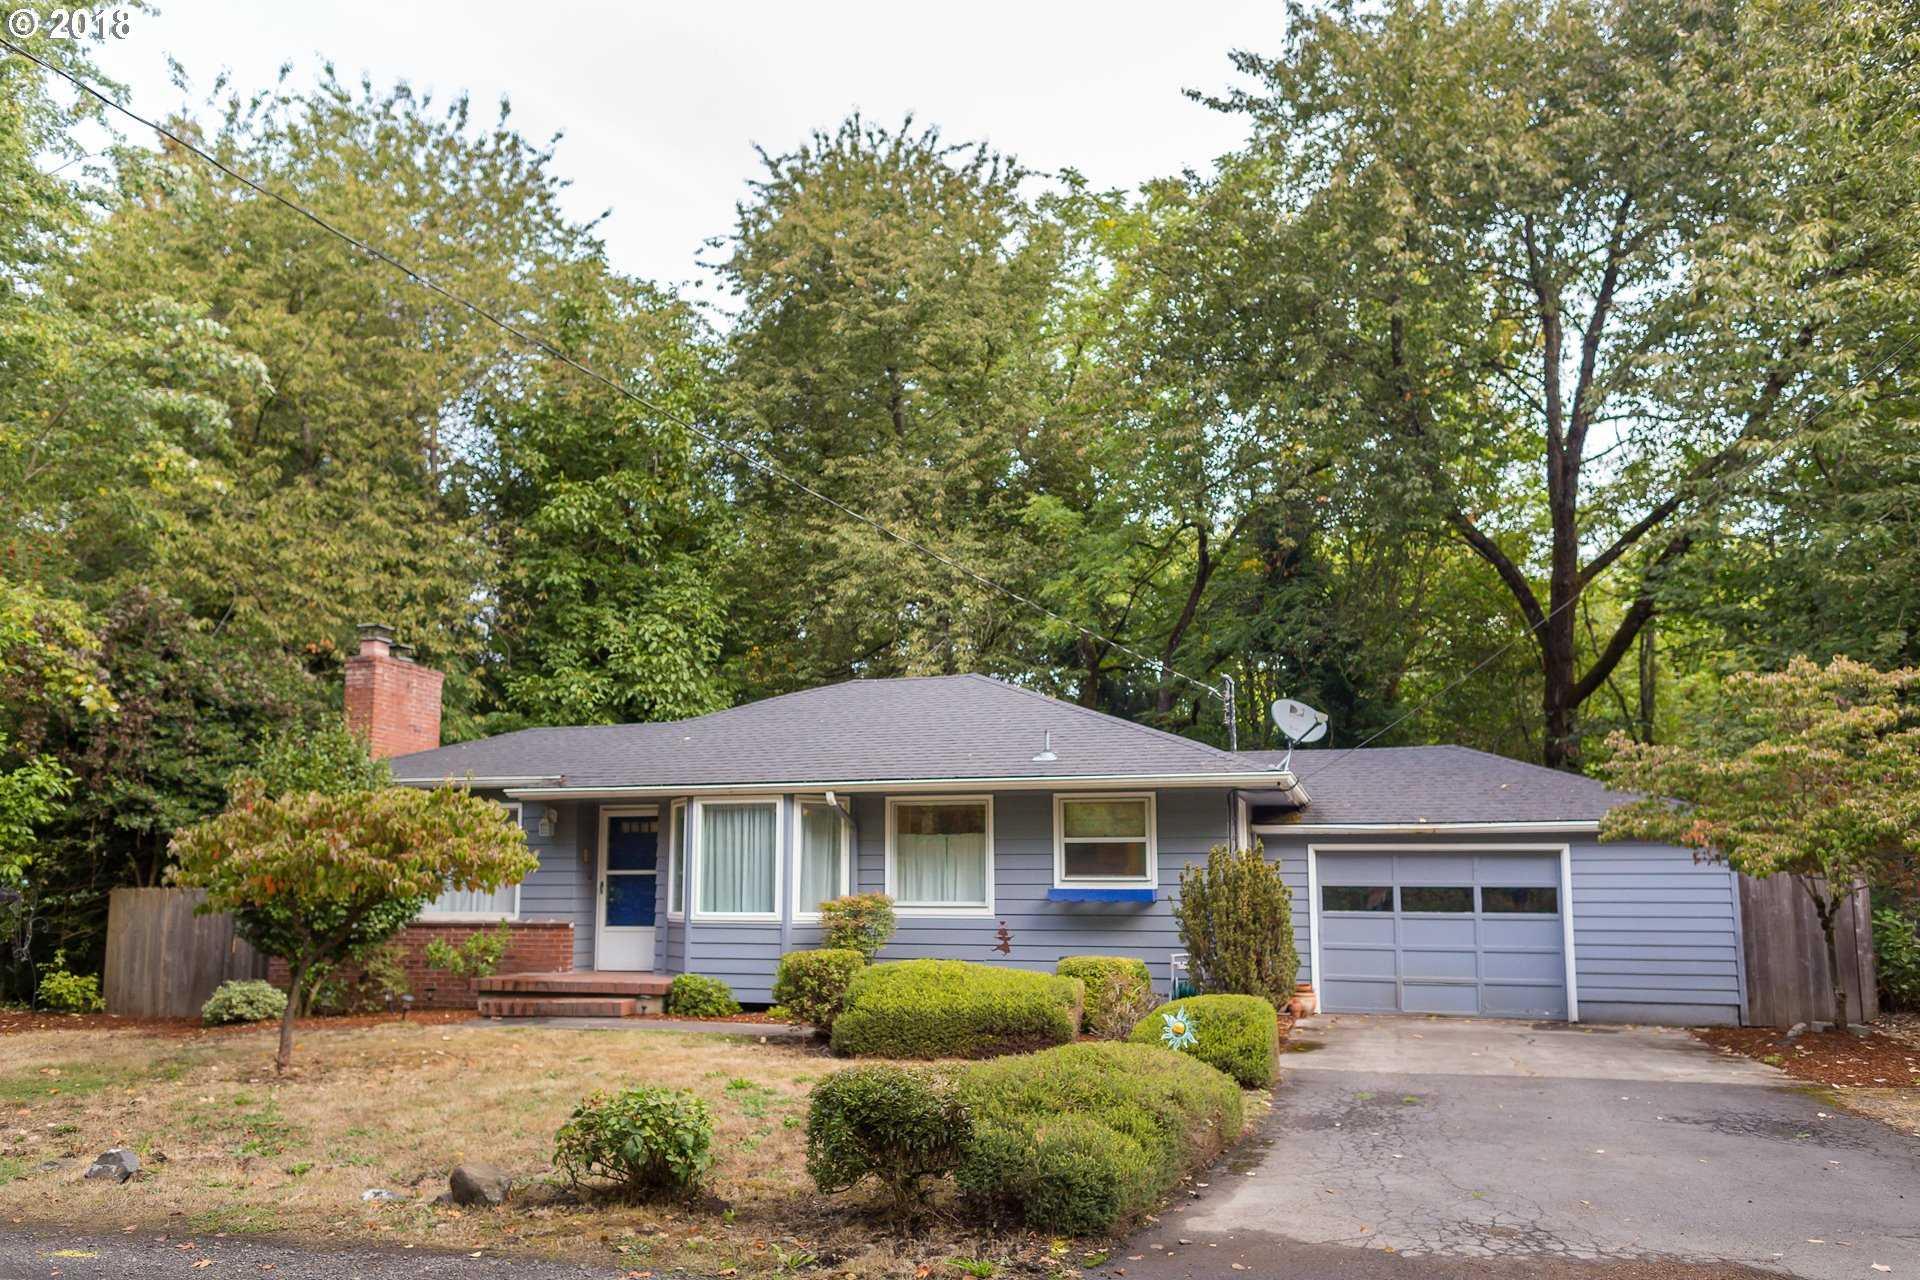 $499,900 - 4Br/2Ba -  for Sale in Hillsdale, Portland